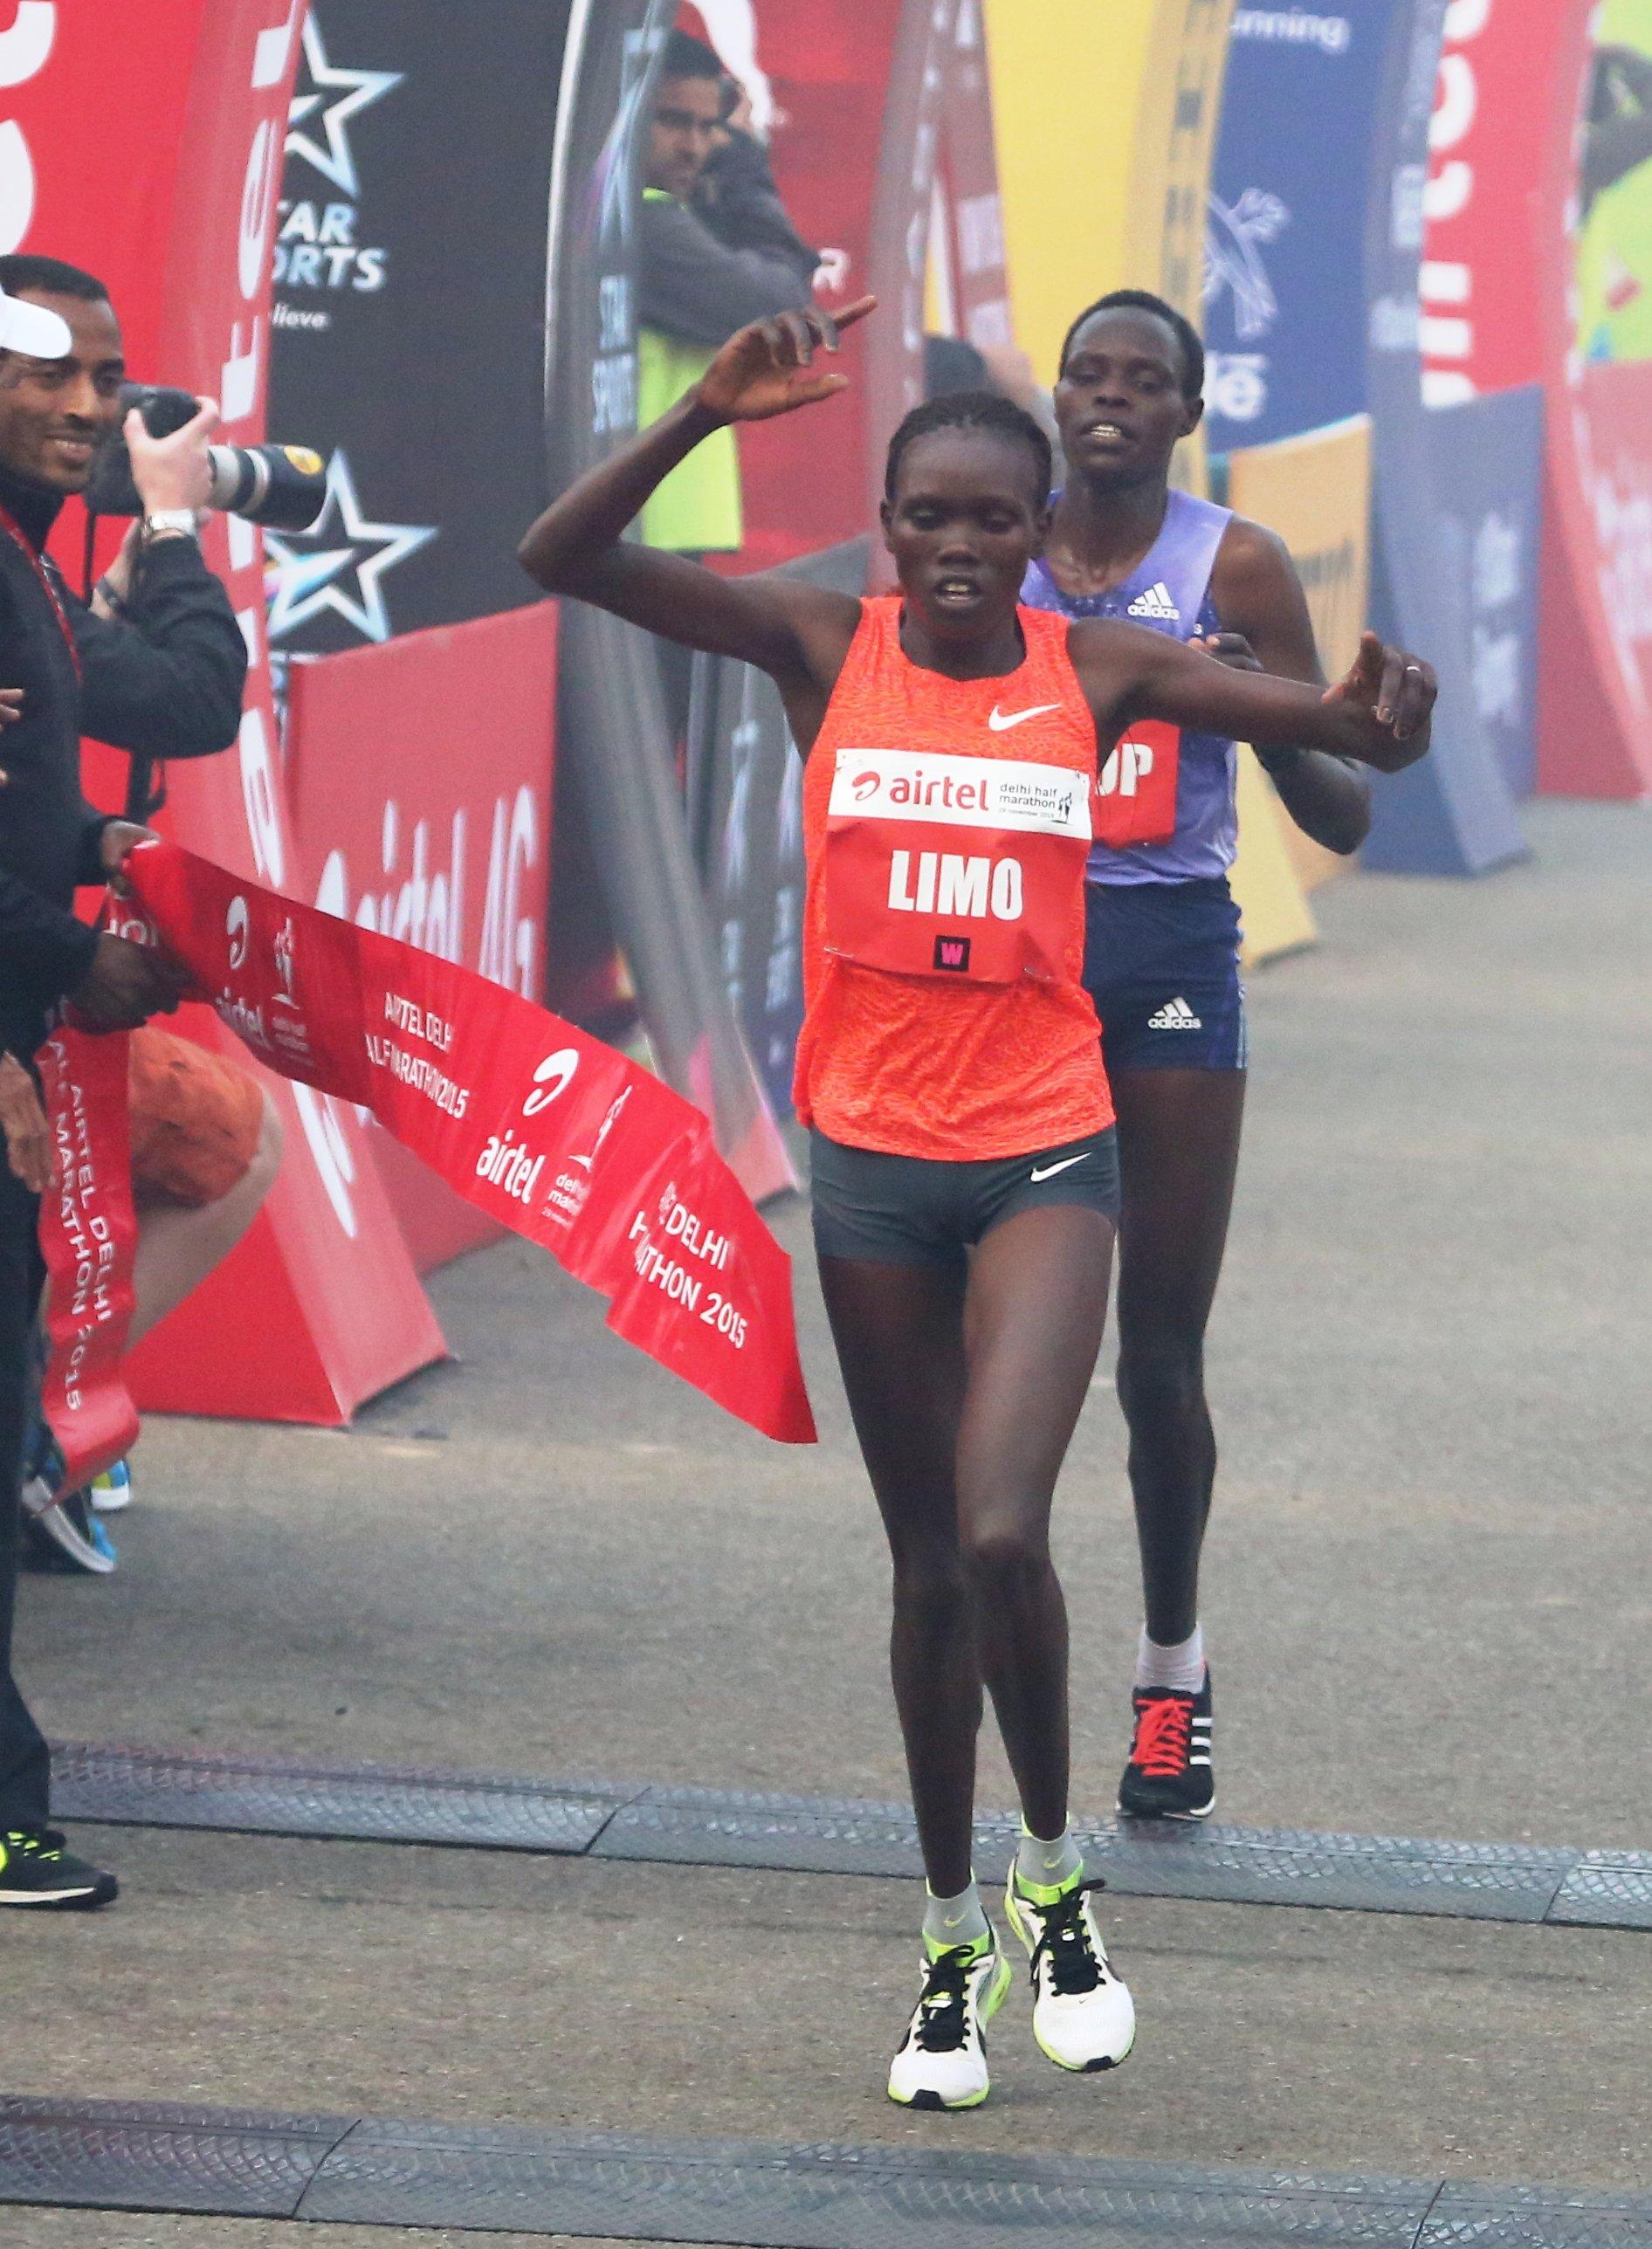 Limo winning in New Delhi in November. Photo courtesy of Airtel Delhi Half Marathon.